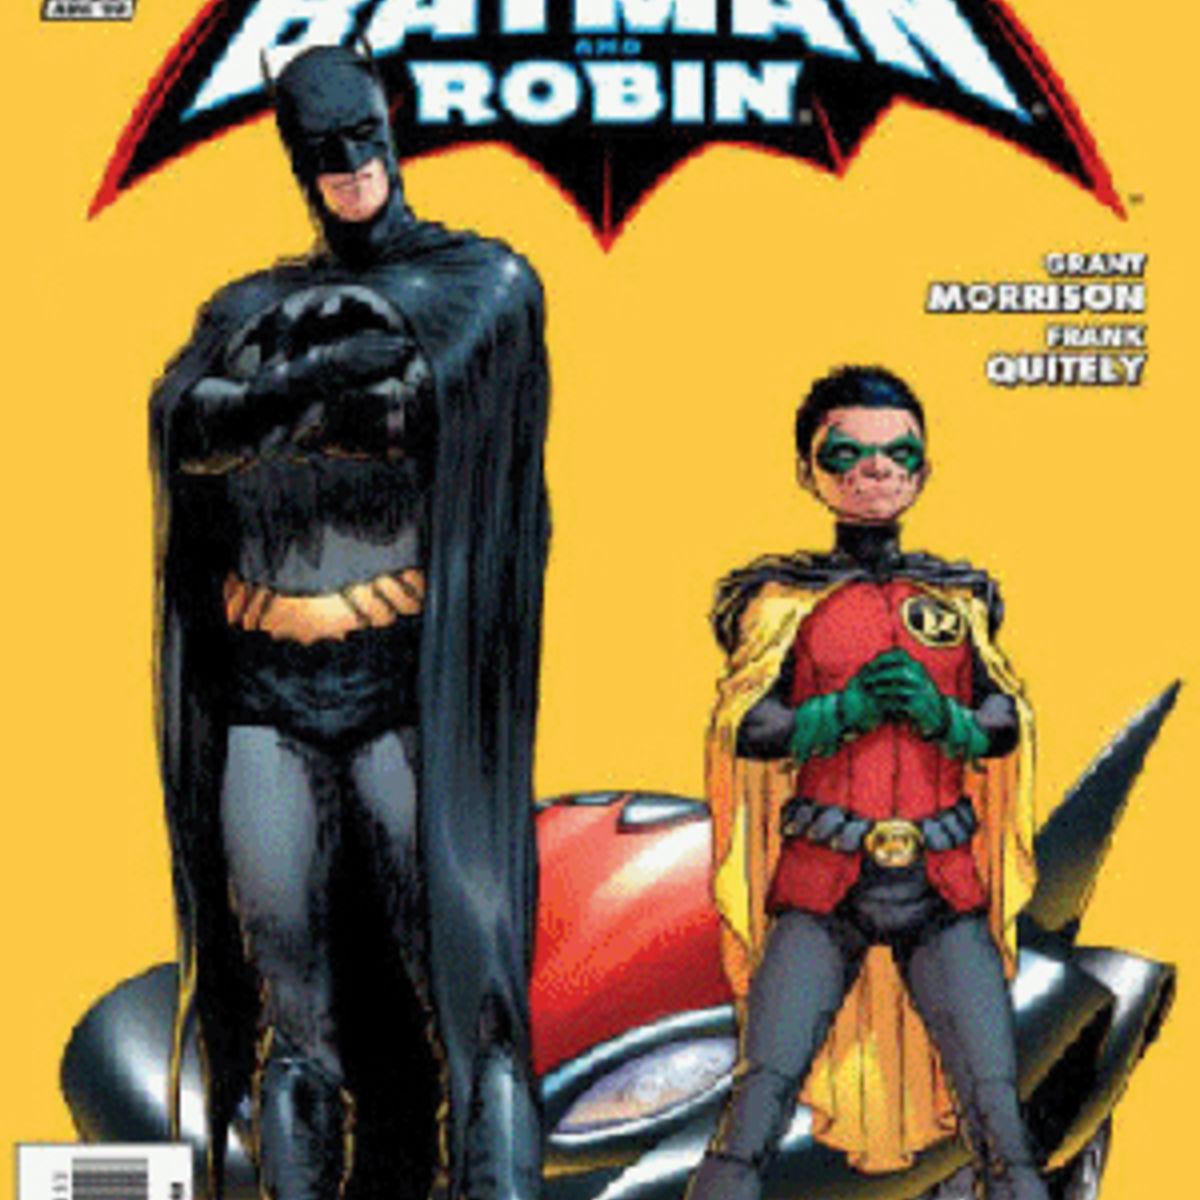 BatmanRobinReview1.jpg